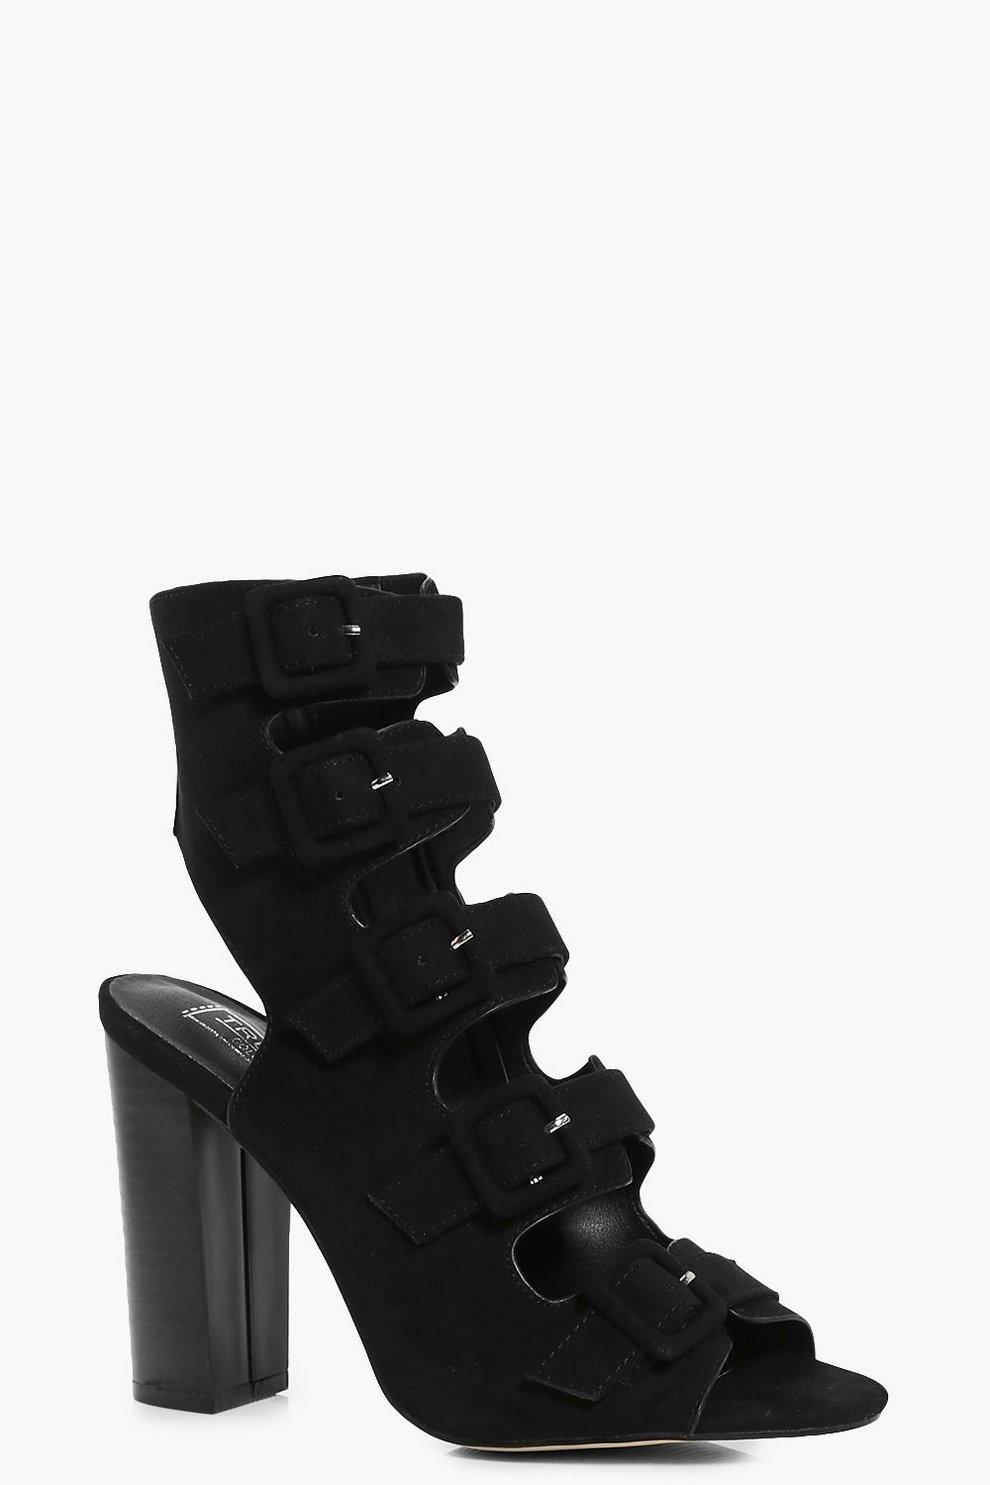 98ec5498a92 Isabelle Multi Buckle Block Heel Sandal